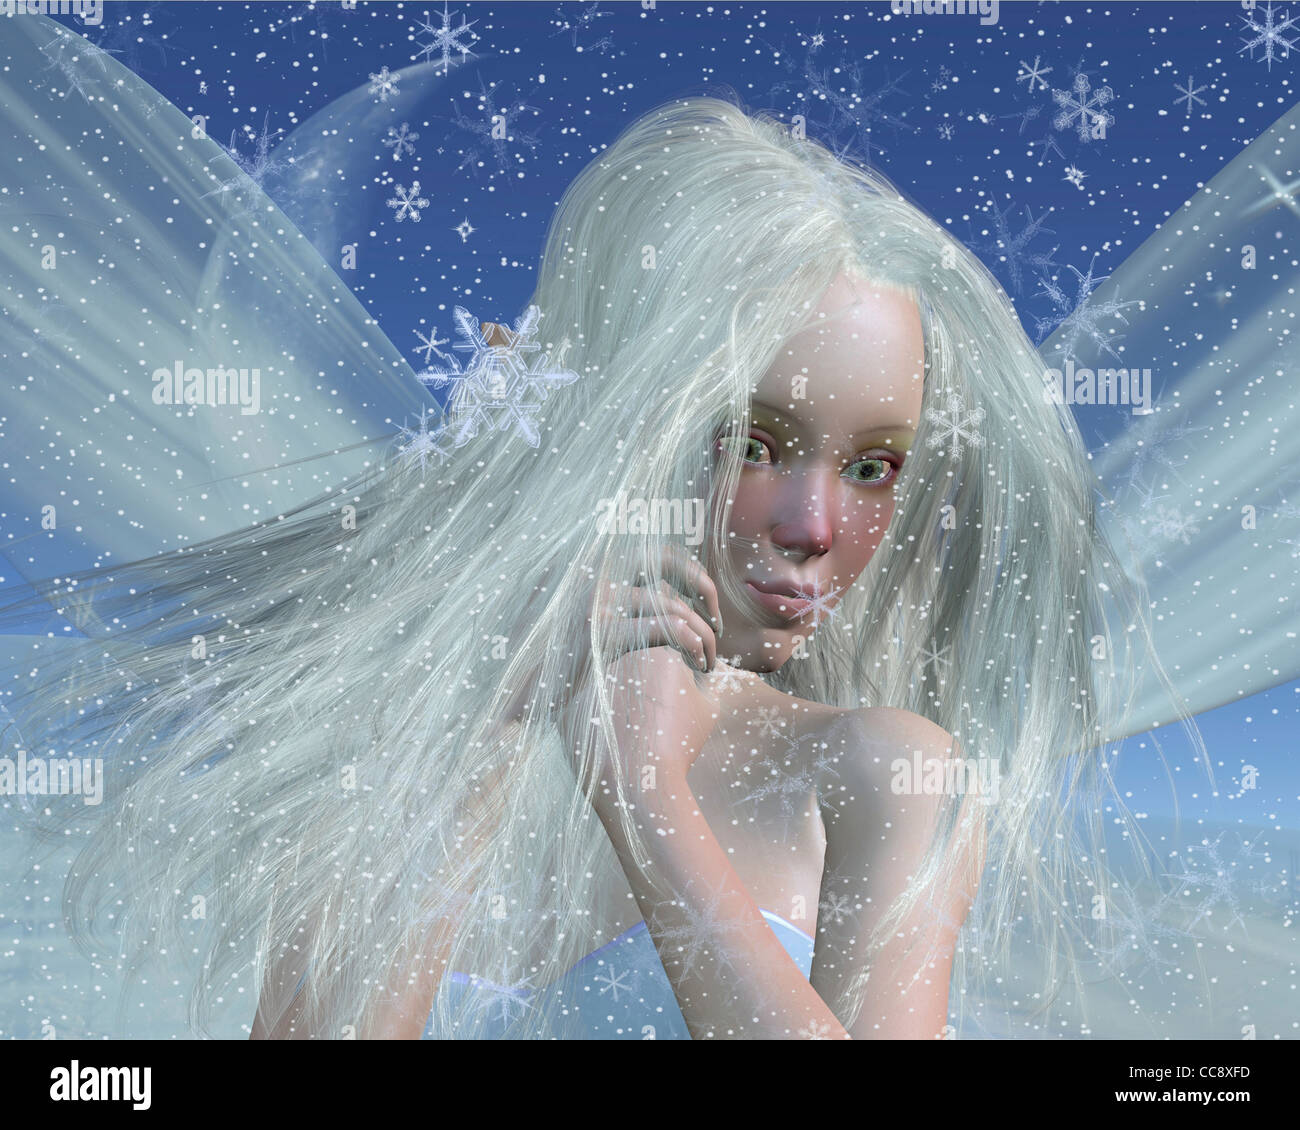 Cold Winter Fairy Portrait - Stock Image